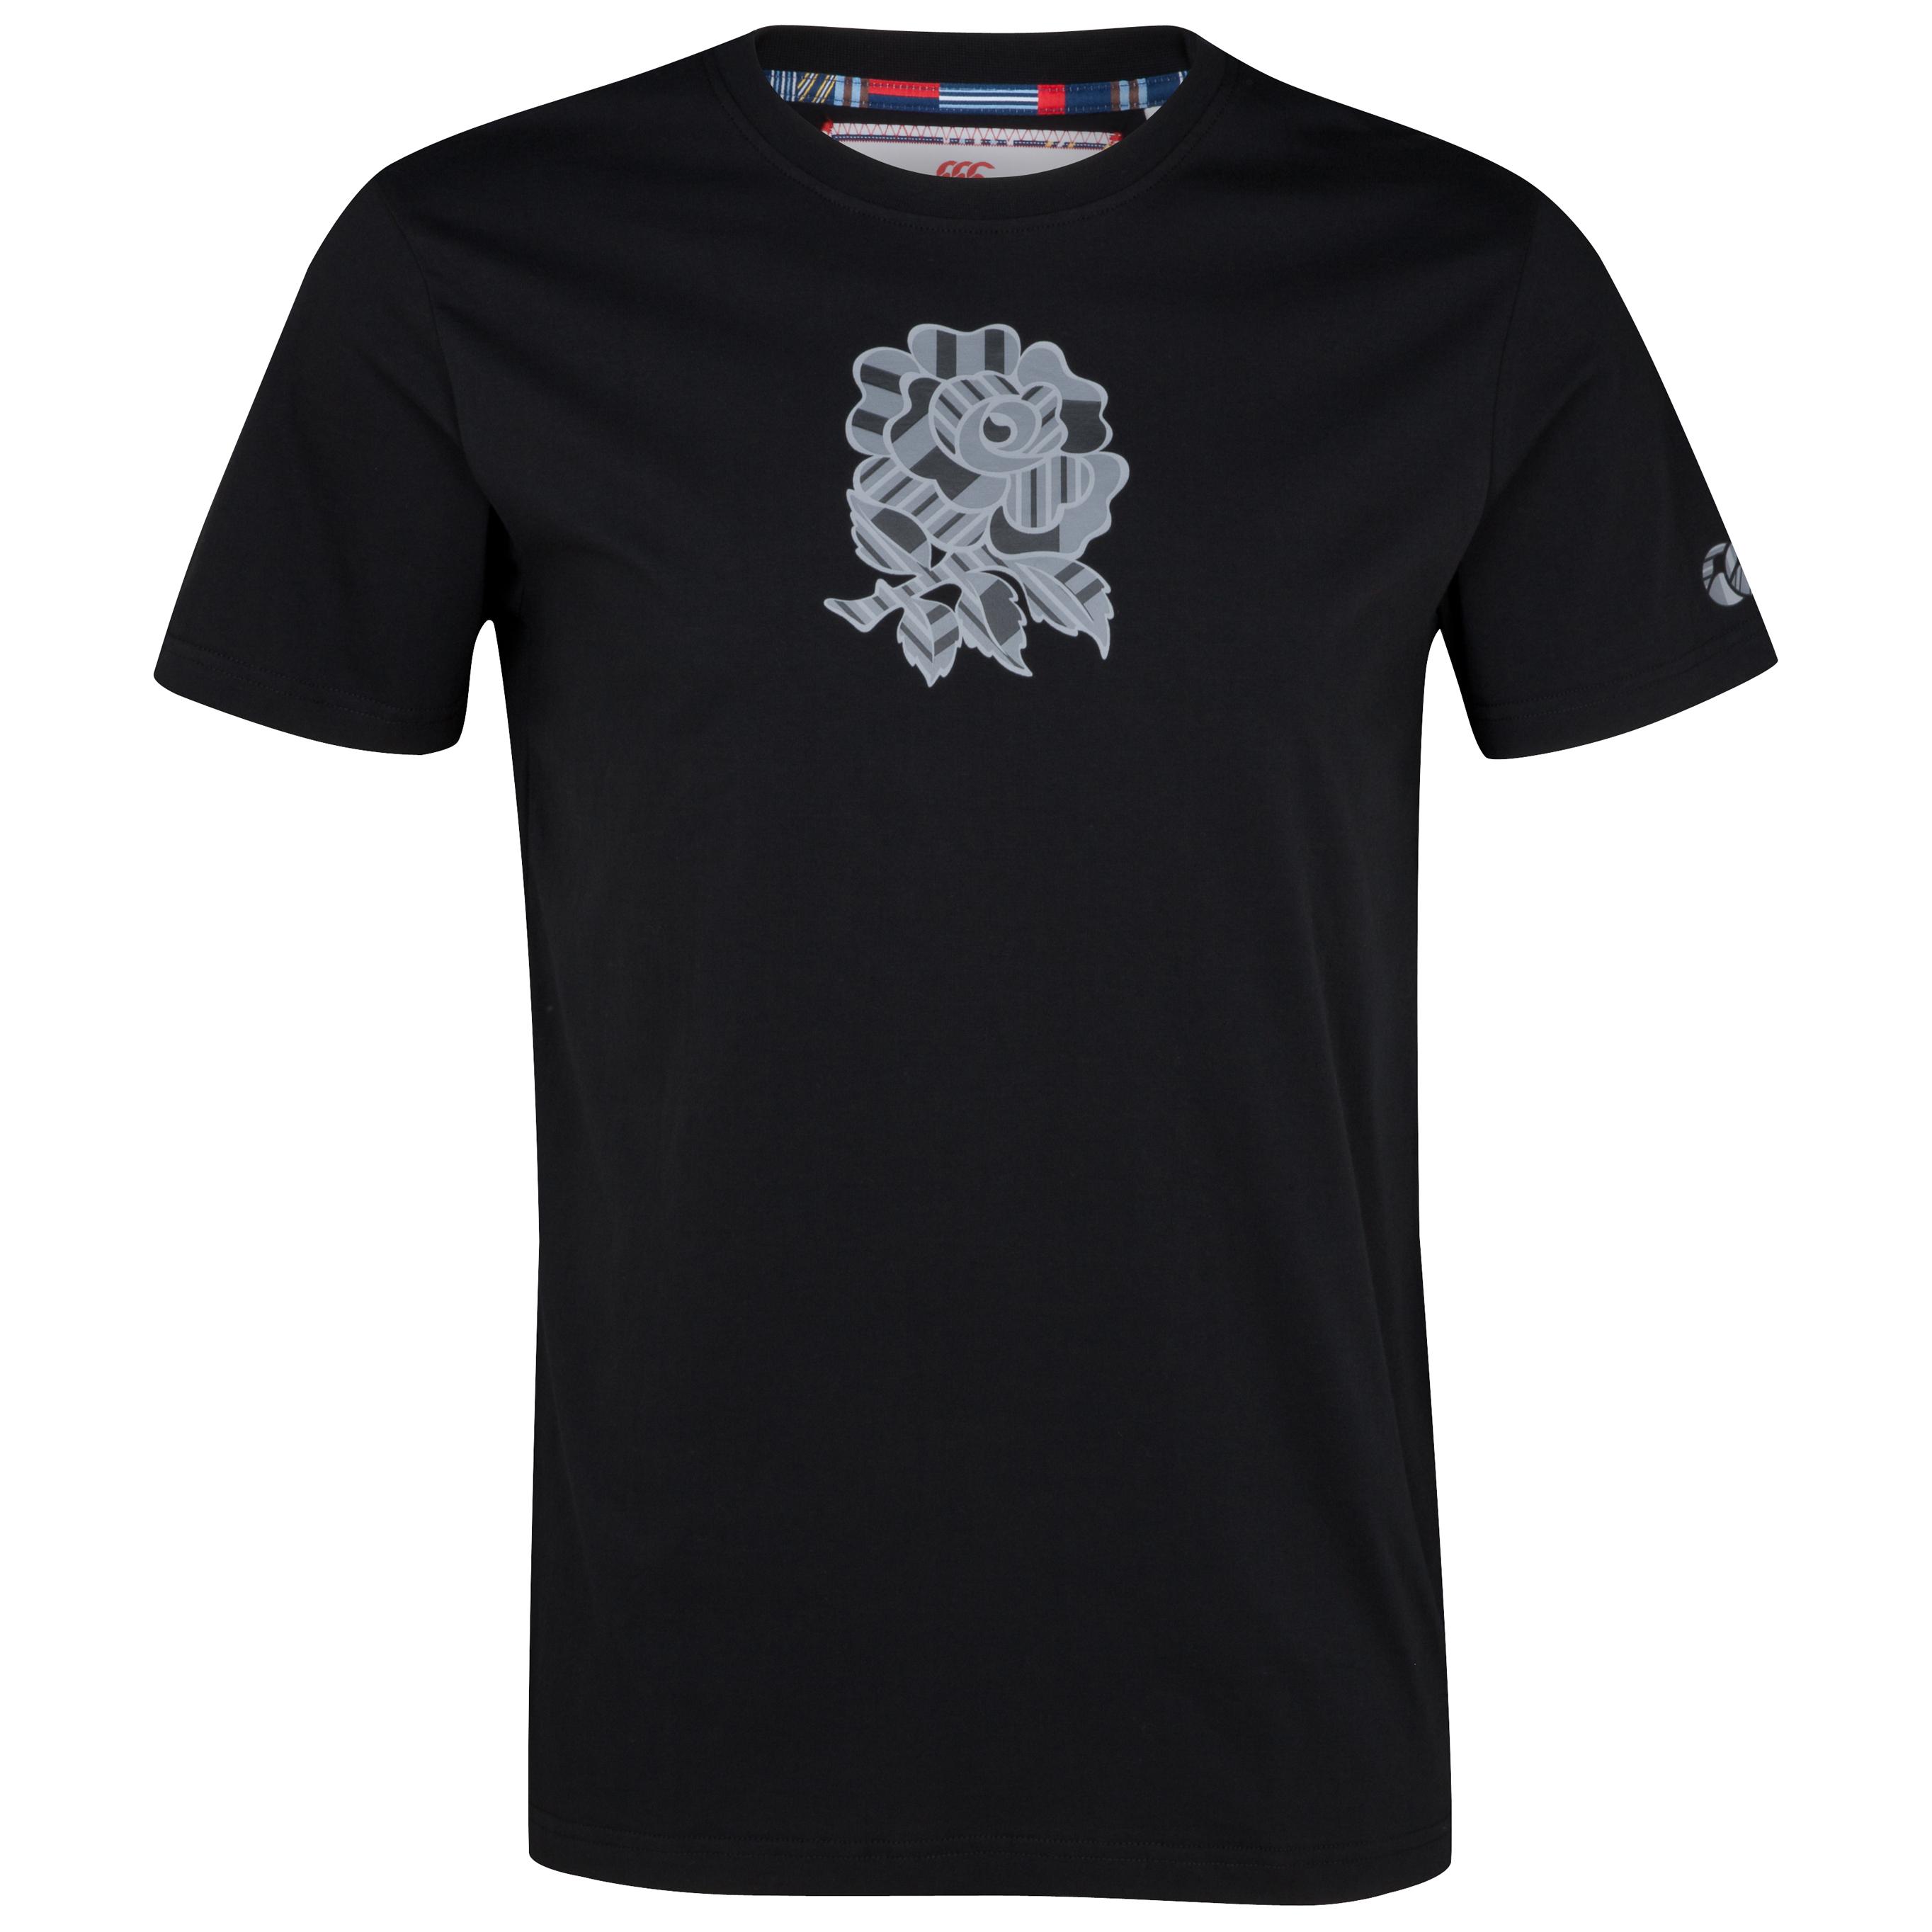 England Uglies Tonal Cotton T-Shirt - Black